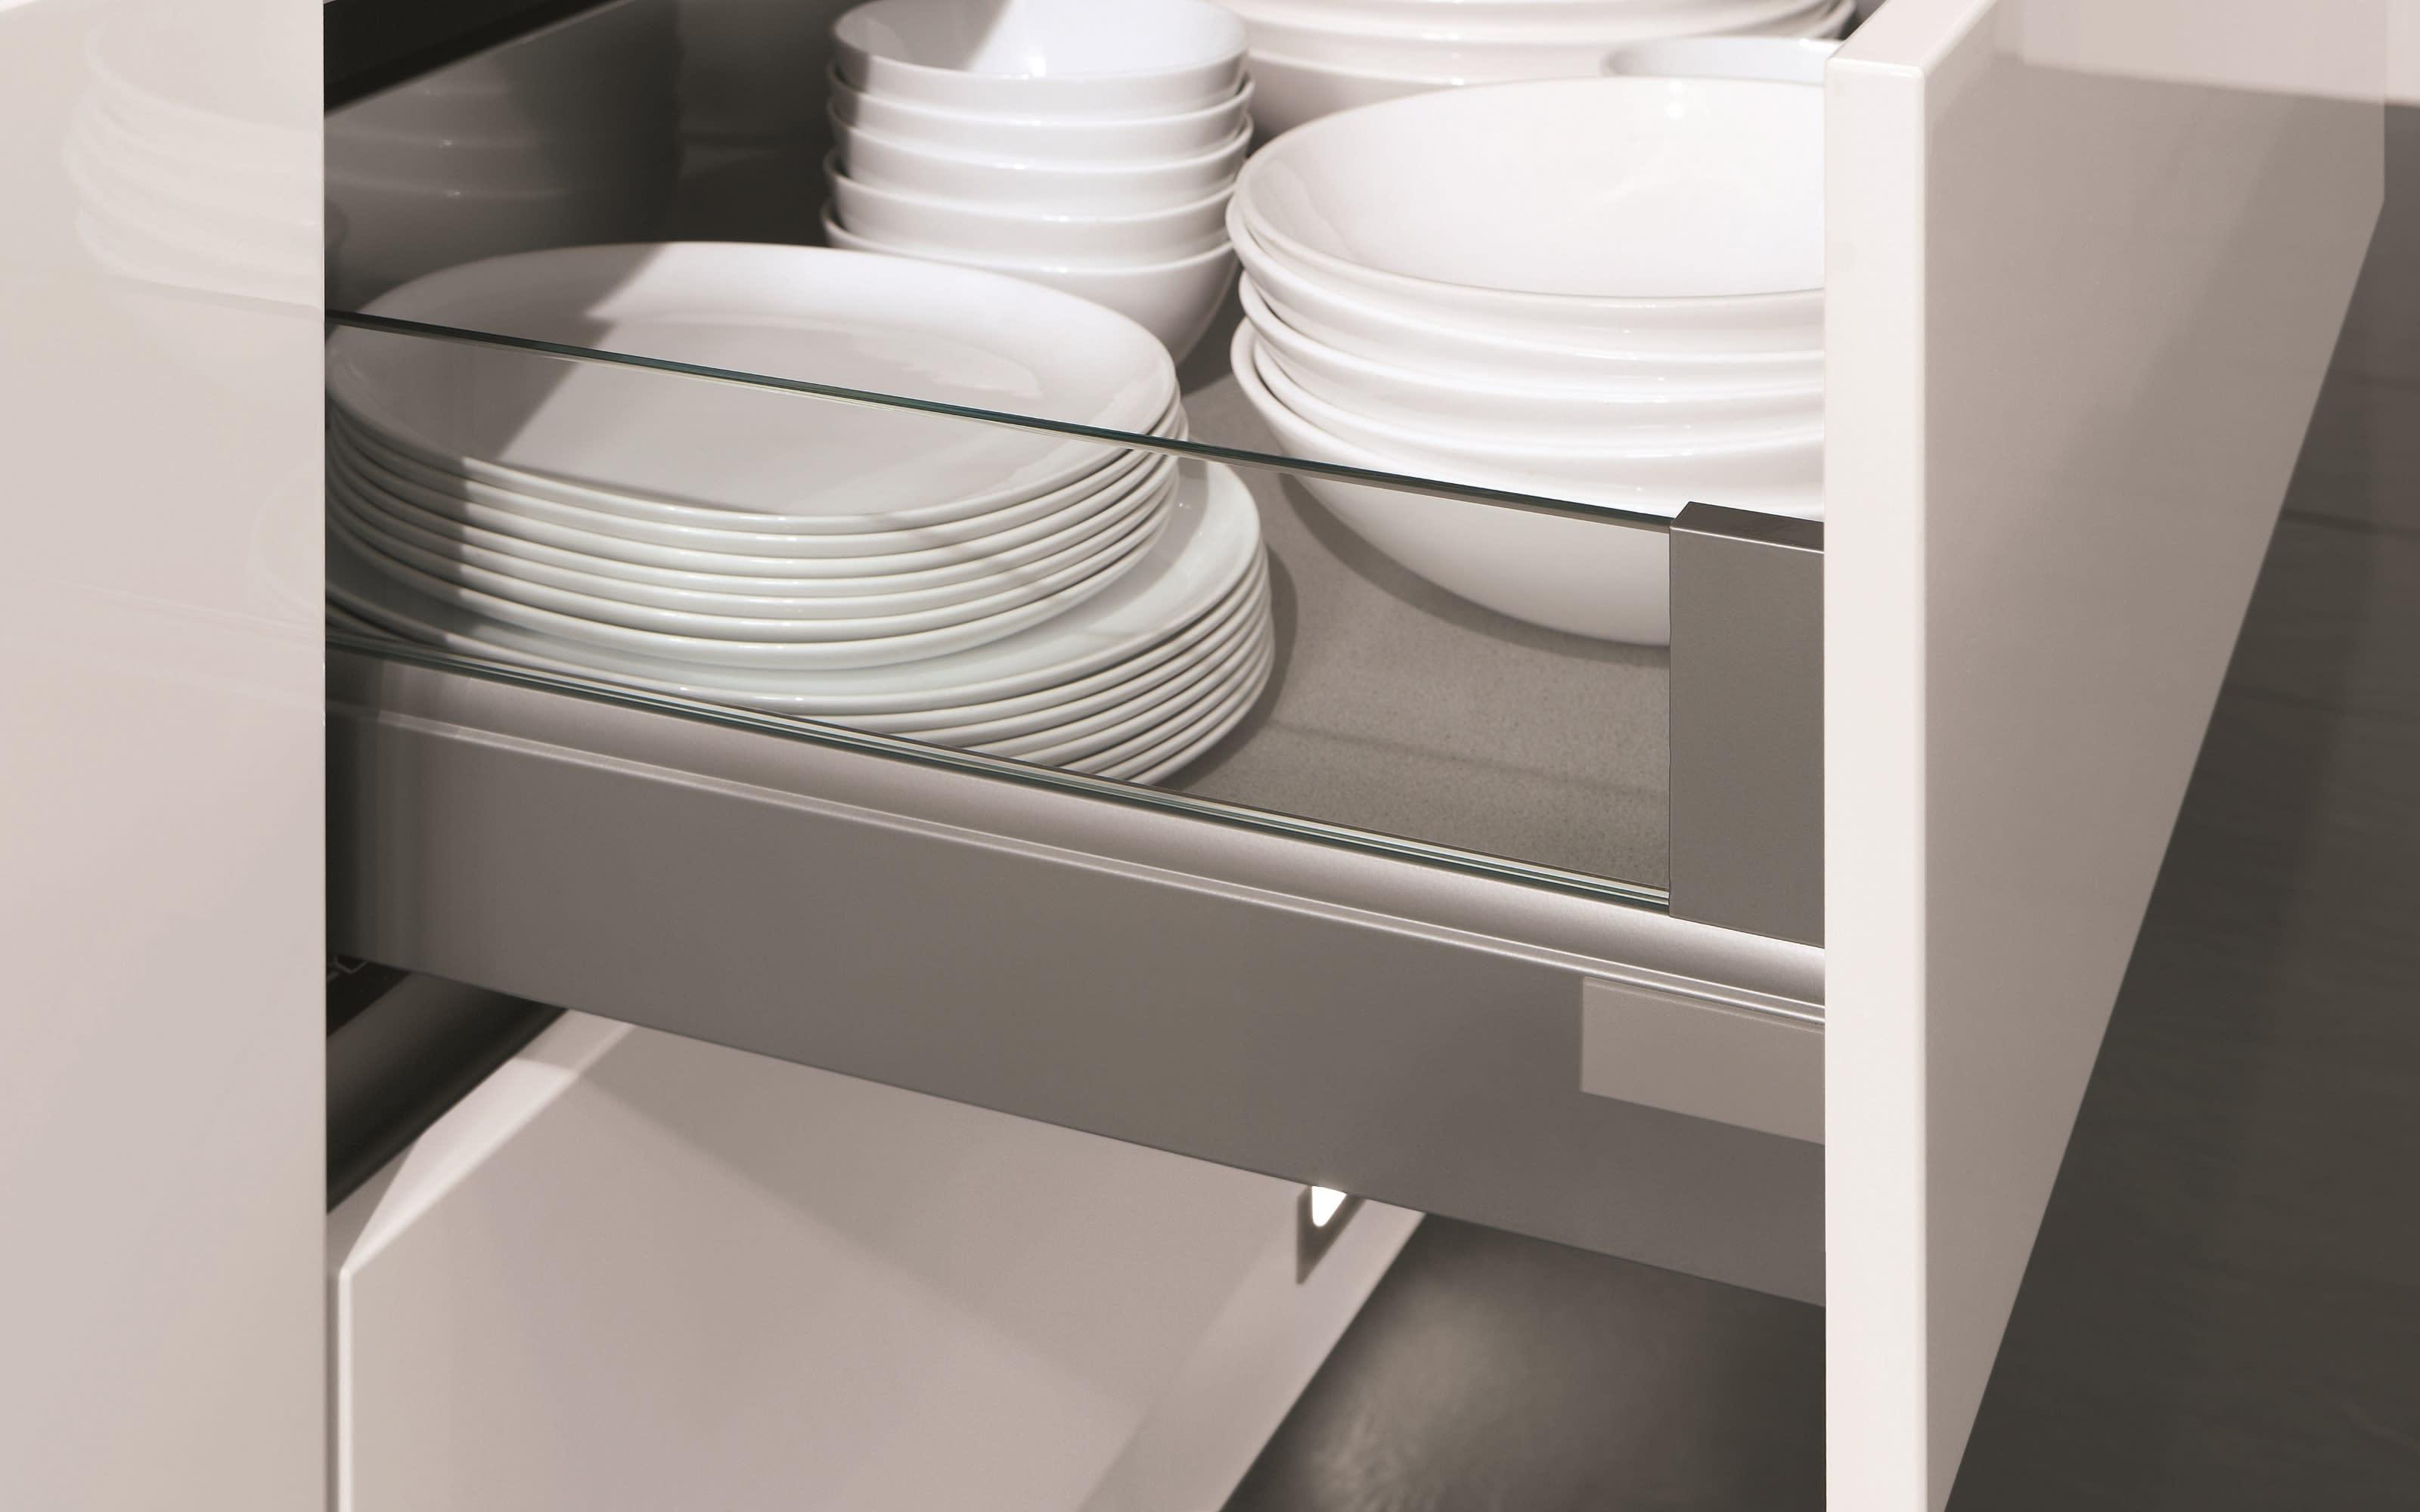 Einbauküche Riva, Weißbeton Nachbildung, inklusive Elektrogeräte